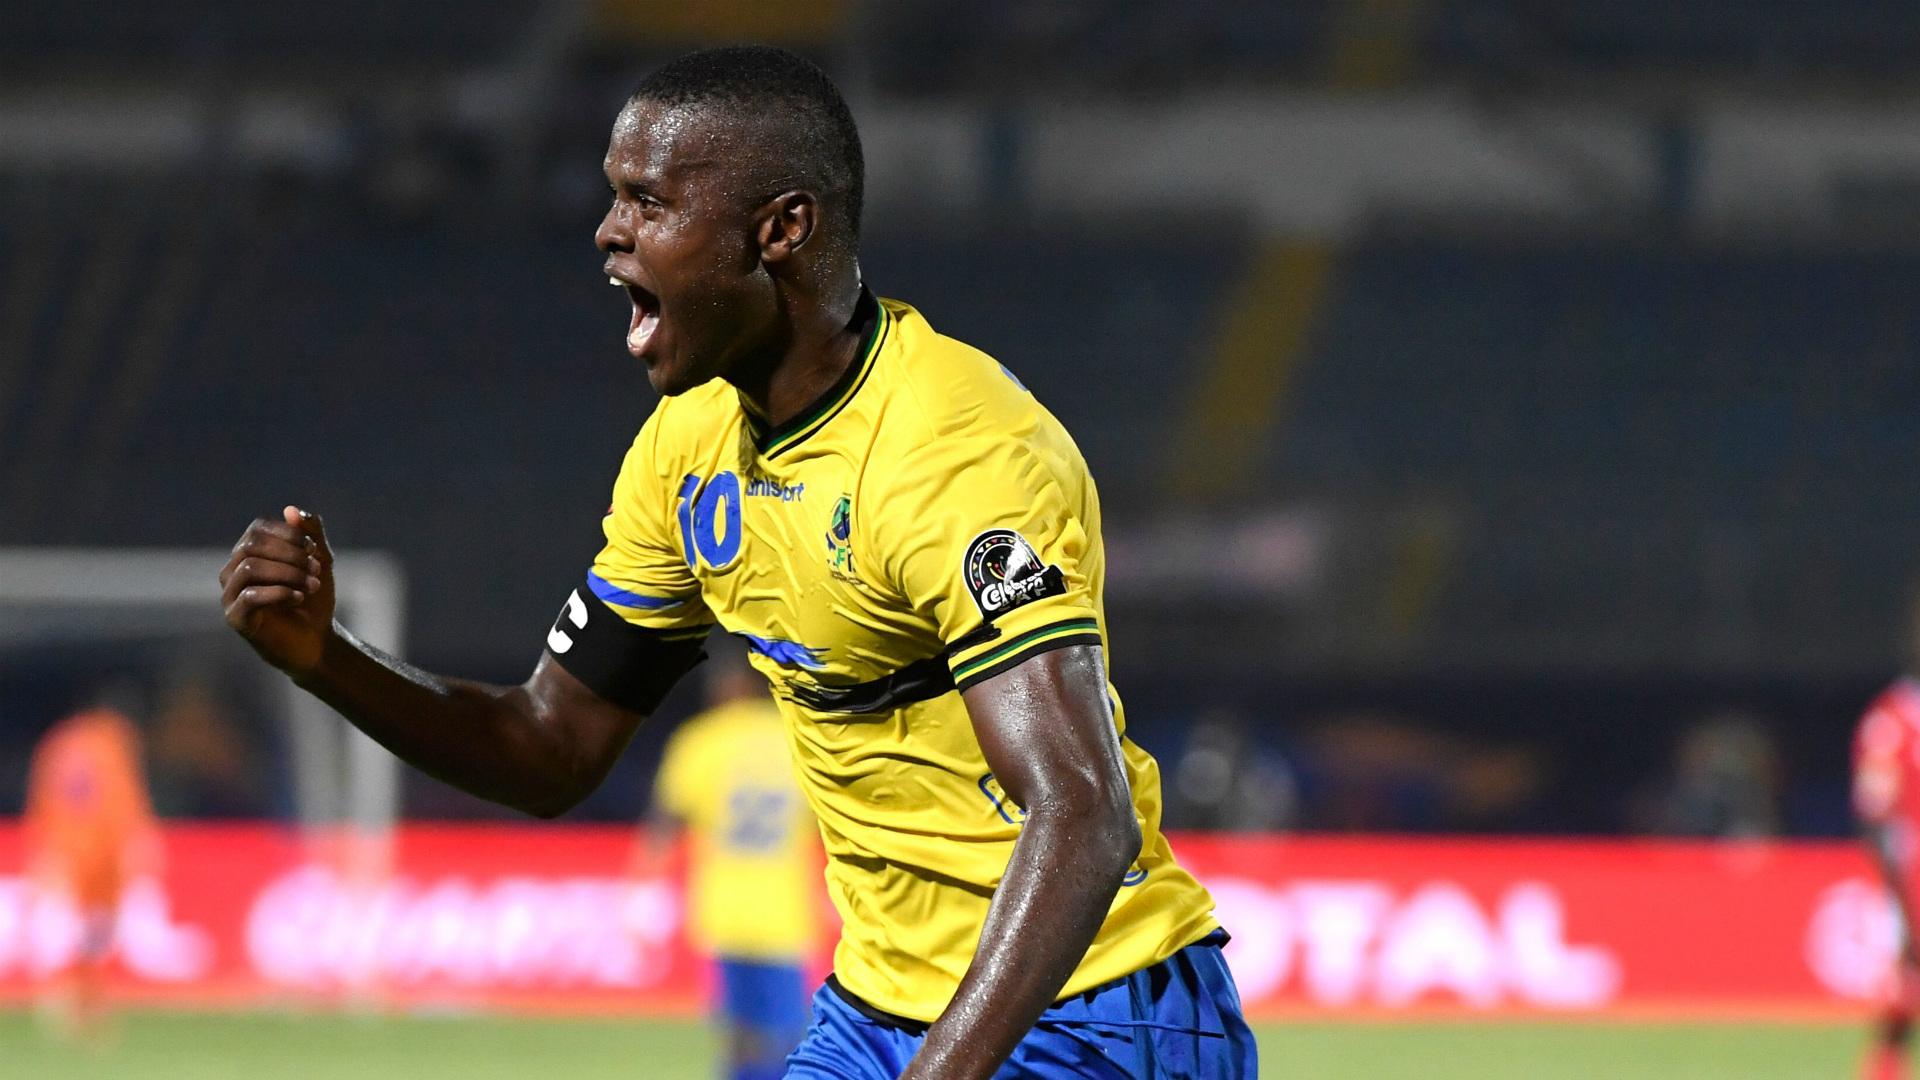 Tanzania captain Mbwana Samatta linked with move to Middlesbrough